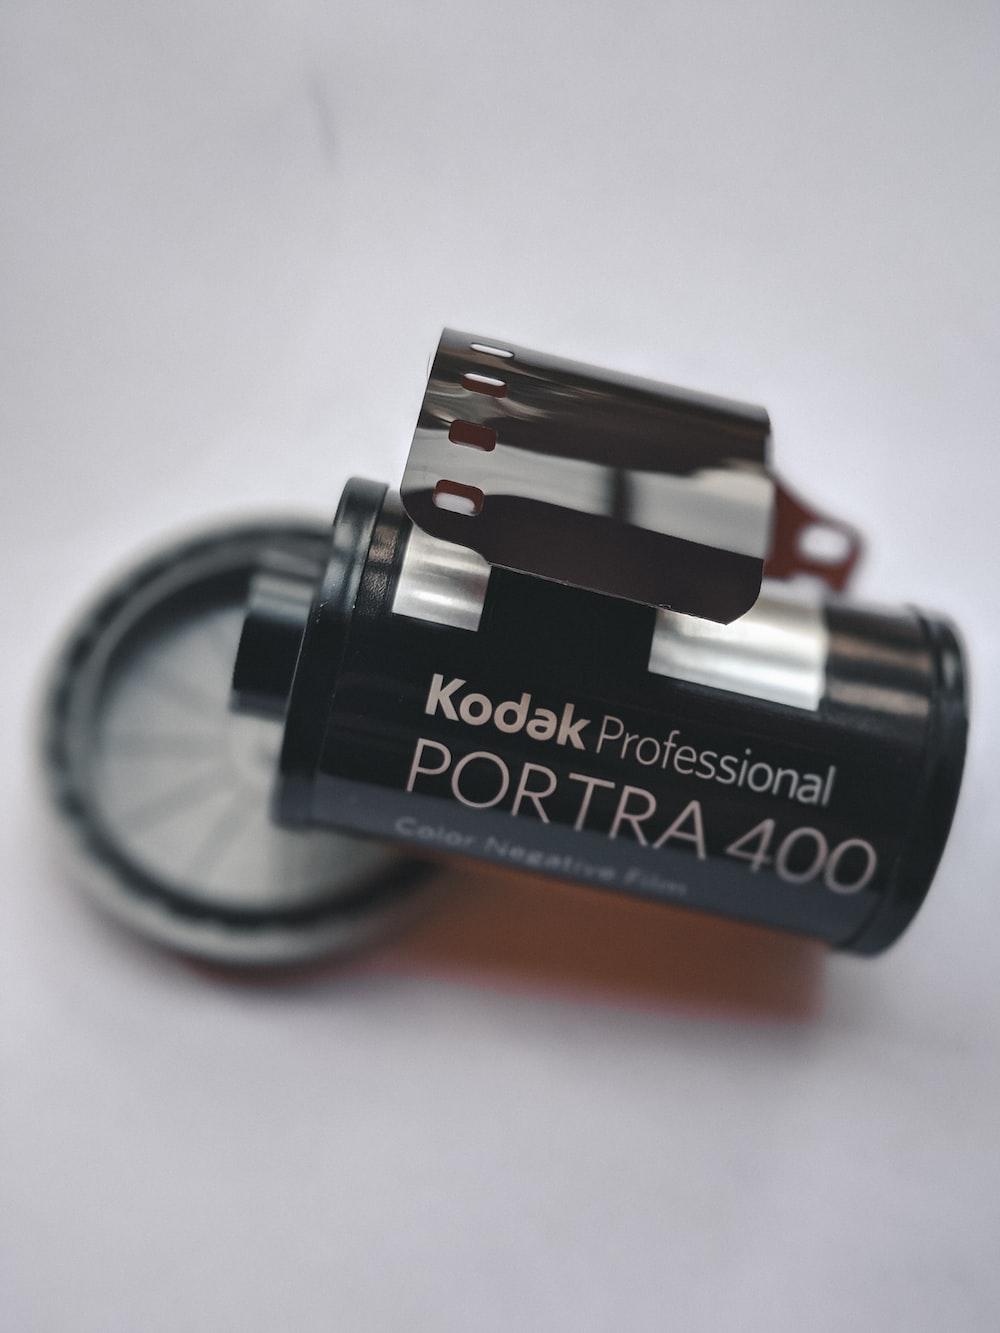 Kodak Professional portra 400 camera film